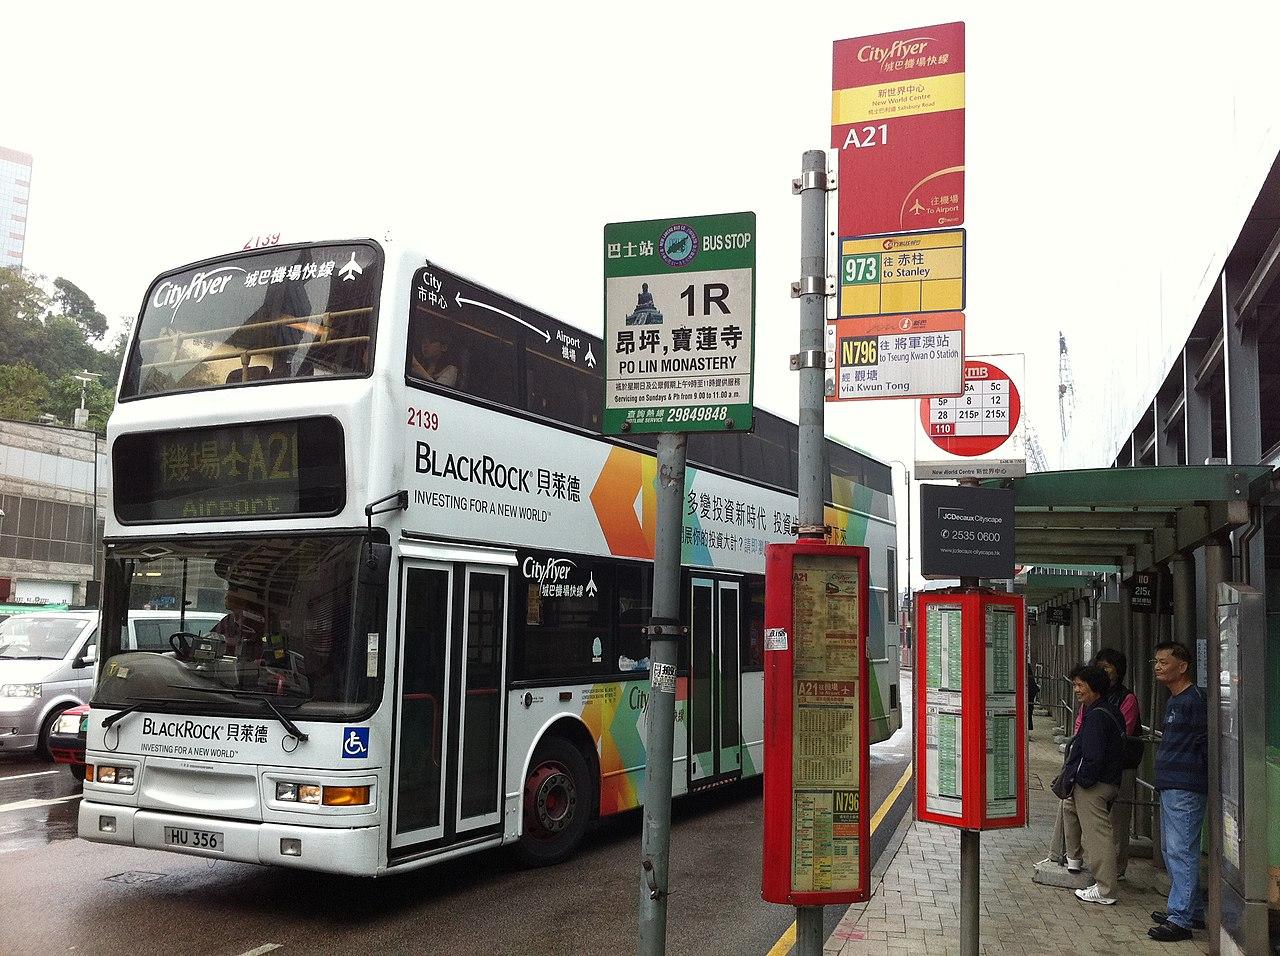 HK TST Salisbury Road bus stop 1R Po Lin Monastery CityFlyer A21 CityBus 973 NWFBus N976 signs Nov-2012.JPG